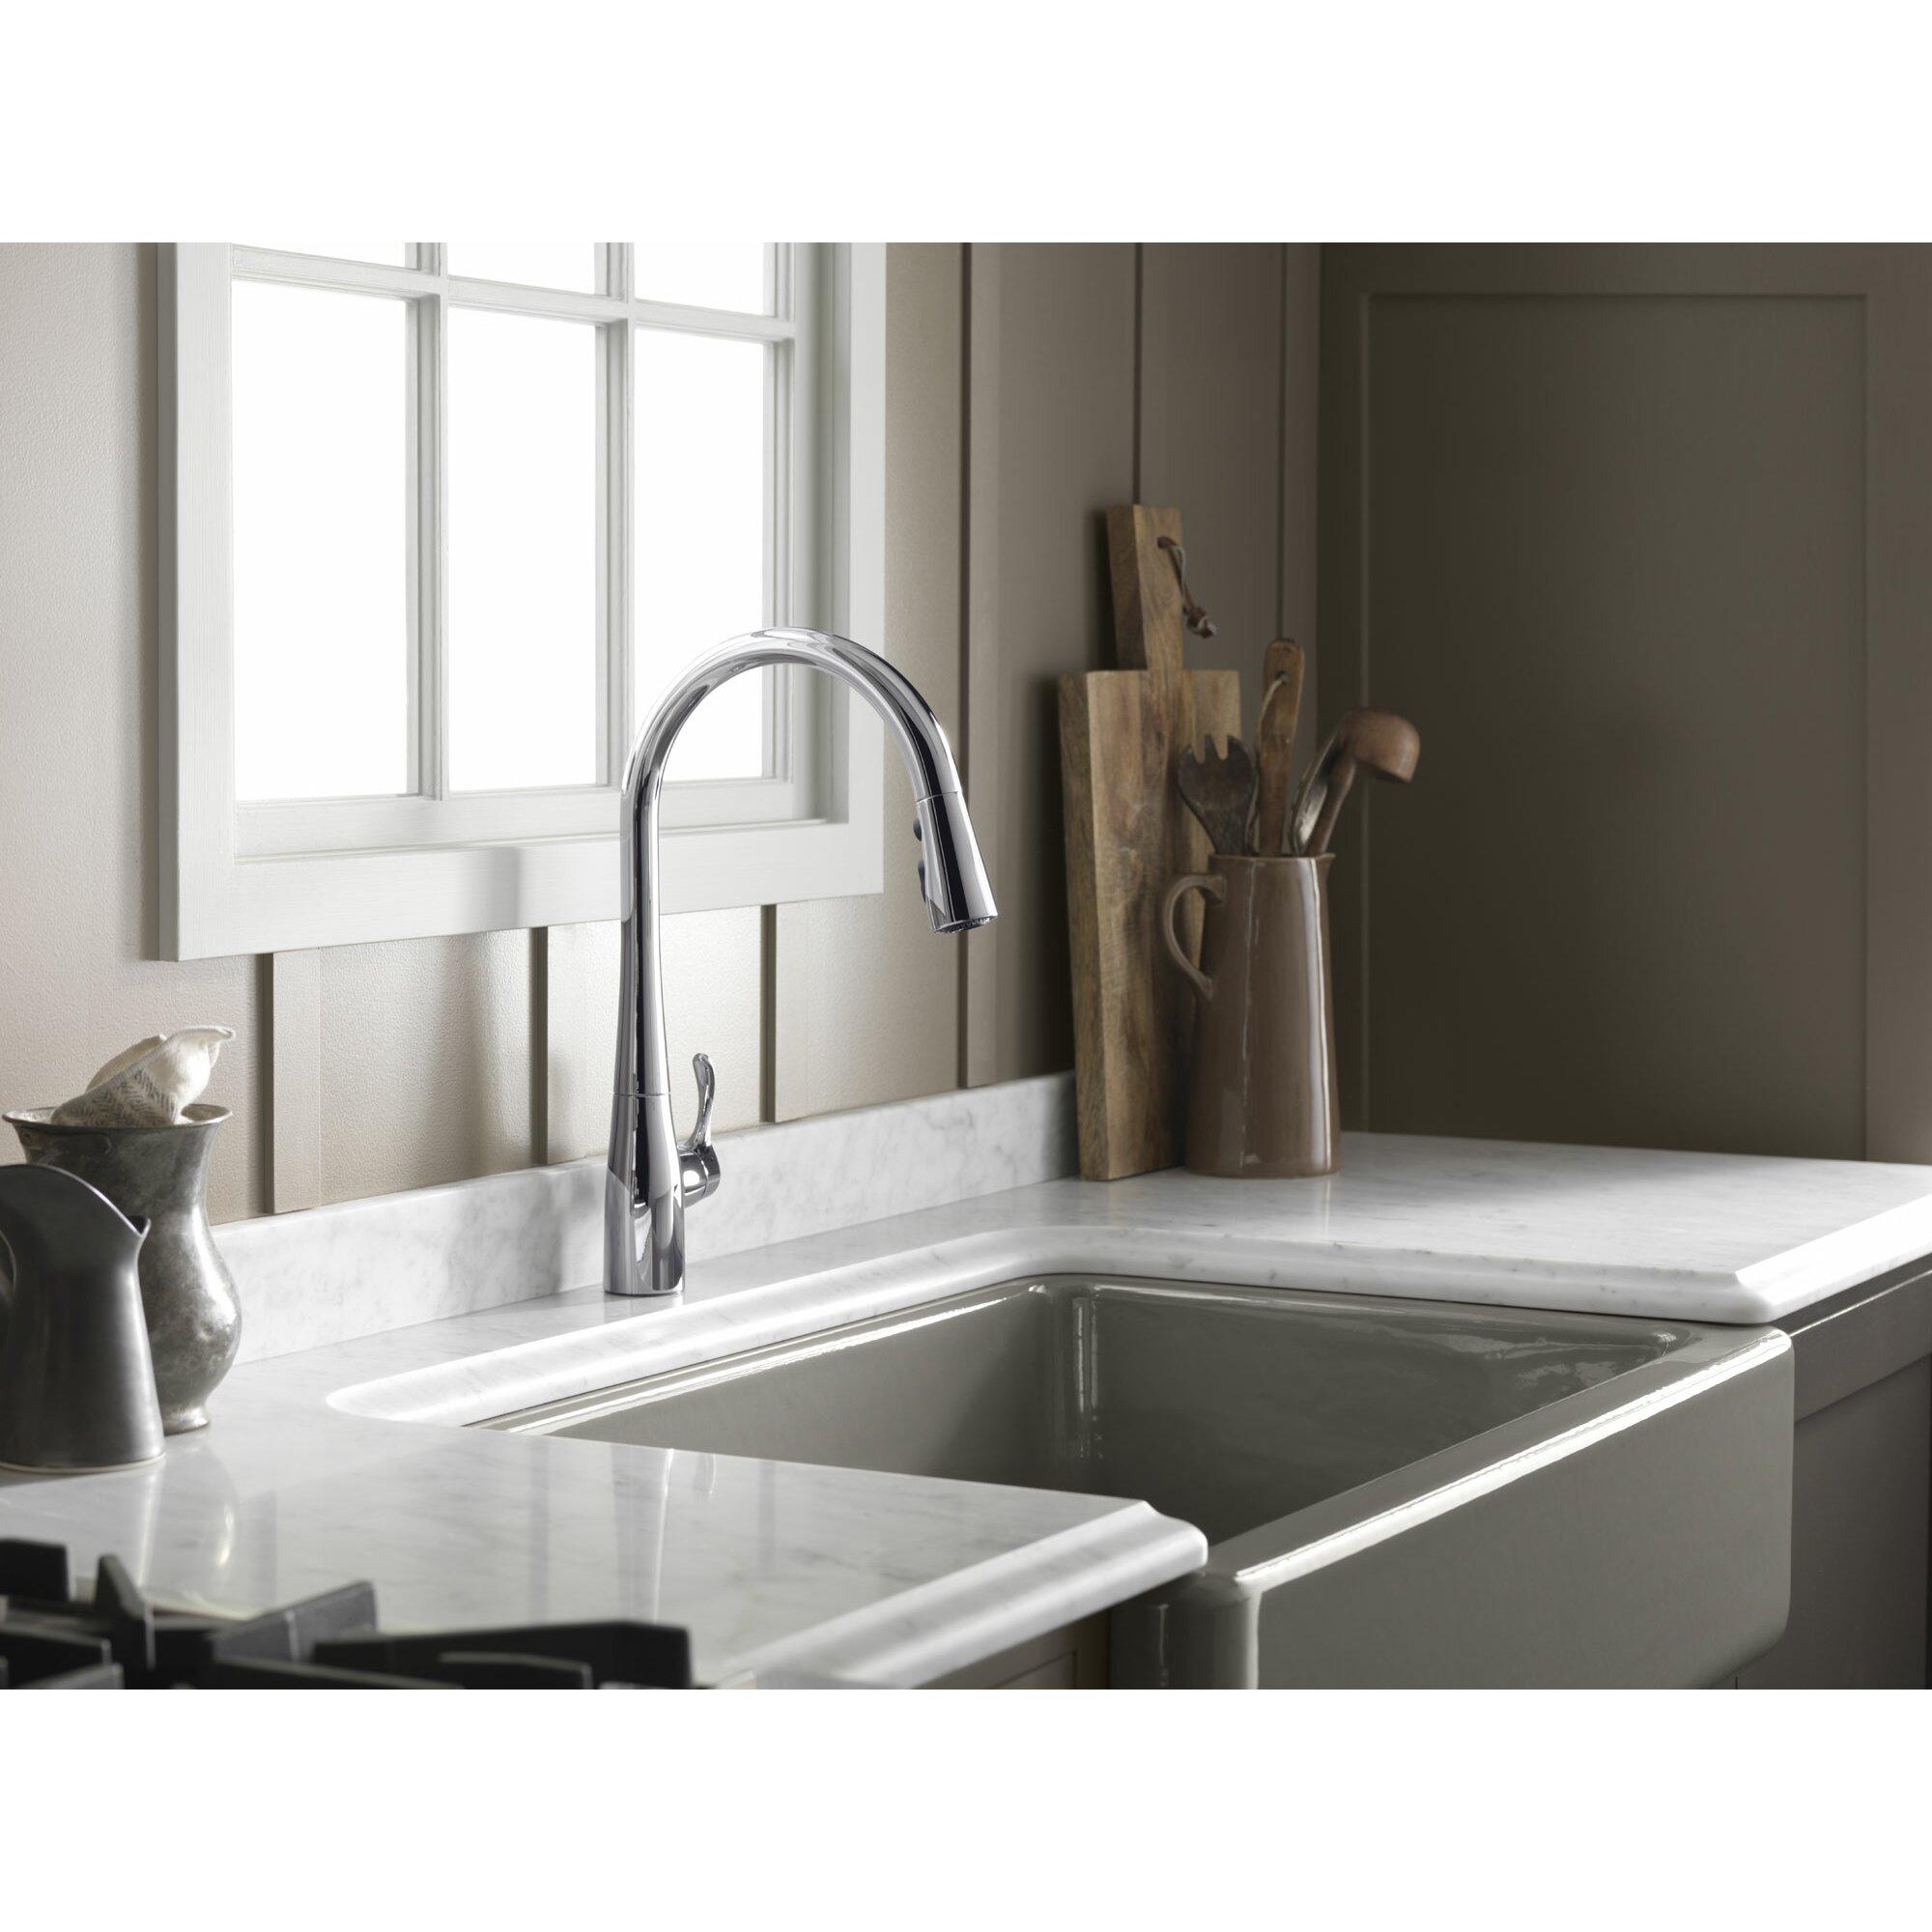 Whole Kitchen Faucet Kohler Simplice Kitchen Sink Faucet With 16 5 8 Pull Down Spout